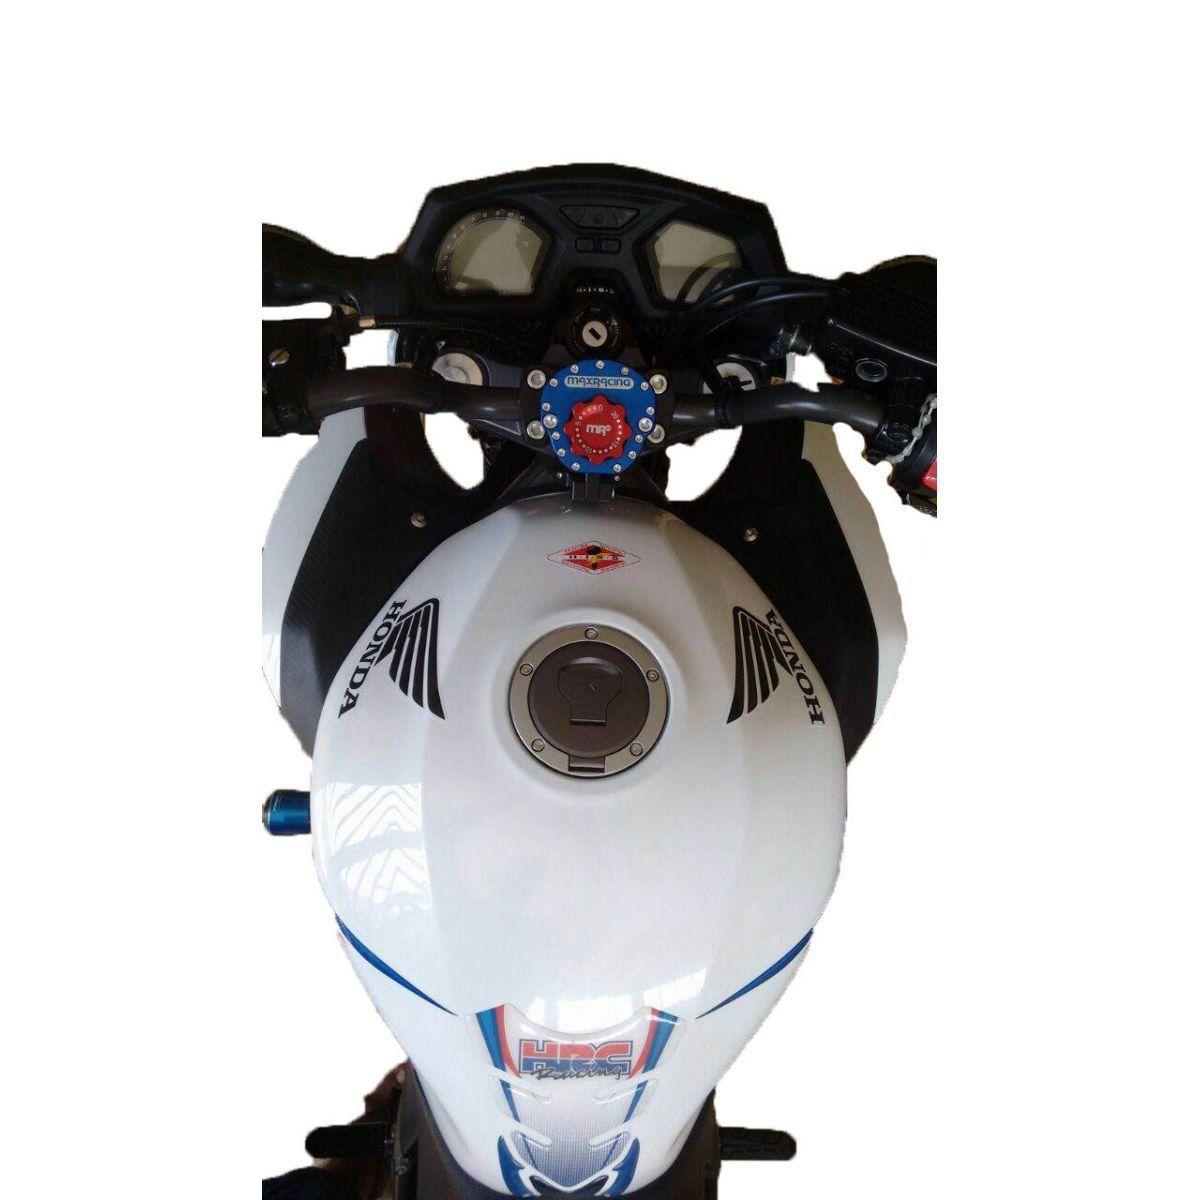 Amortecedor de direção GSX 650 F 2011 a 2013 Max Racing  - Motorshopp